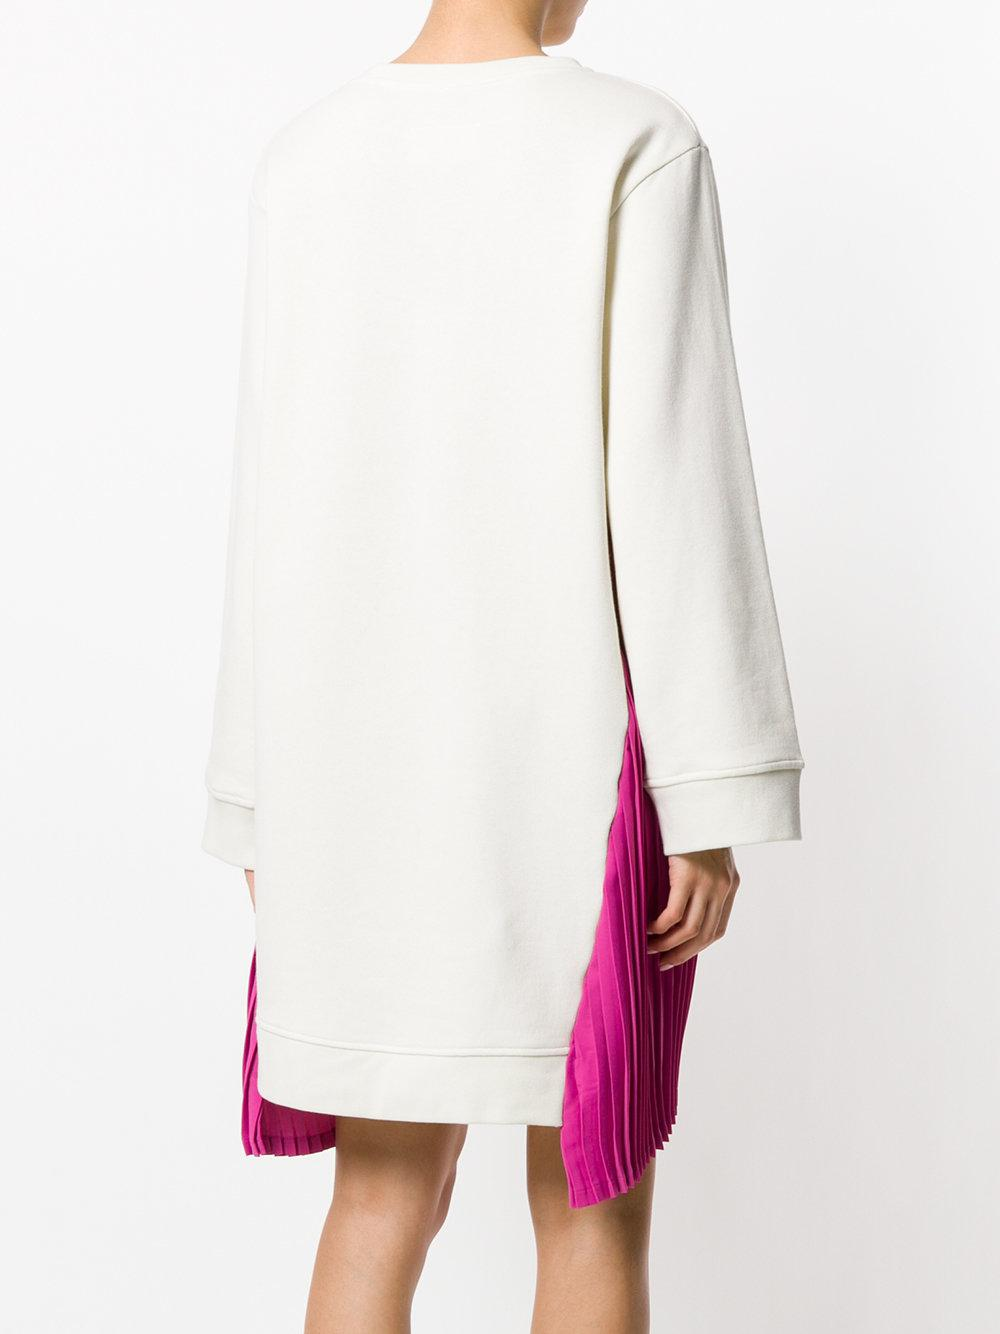 pleated side dress - White Maison Martin Margiela QTj8T